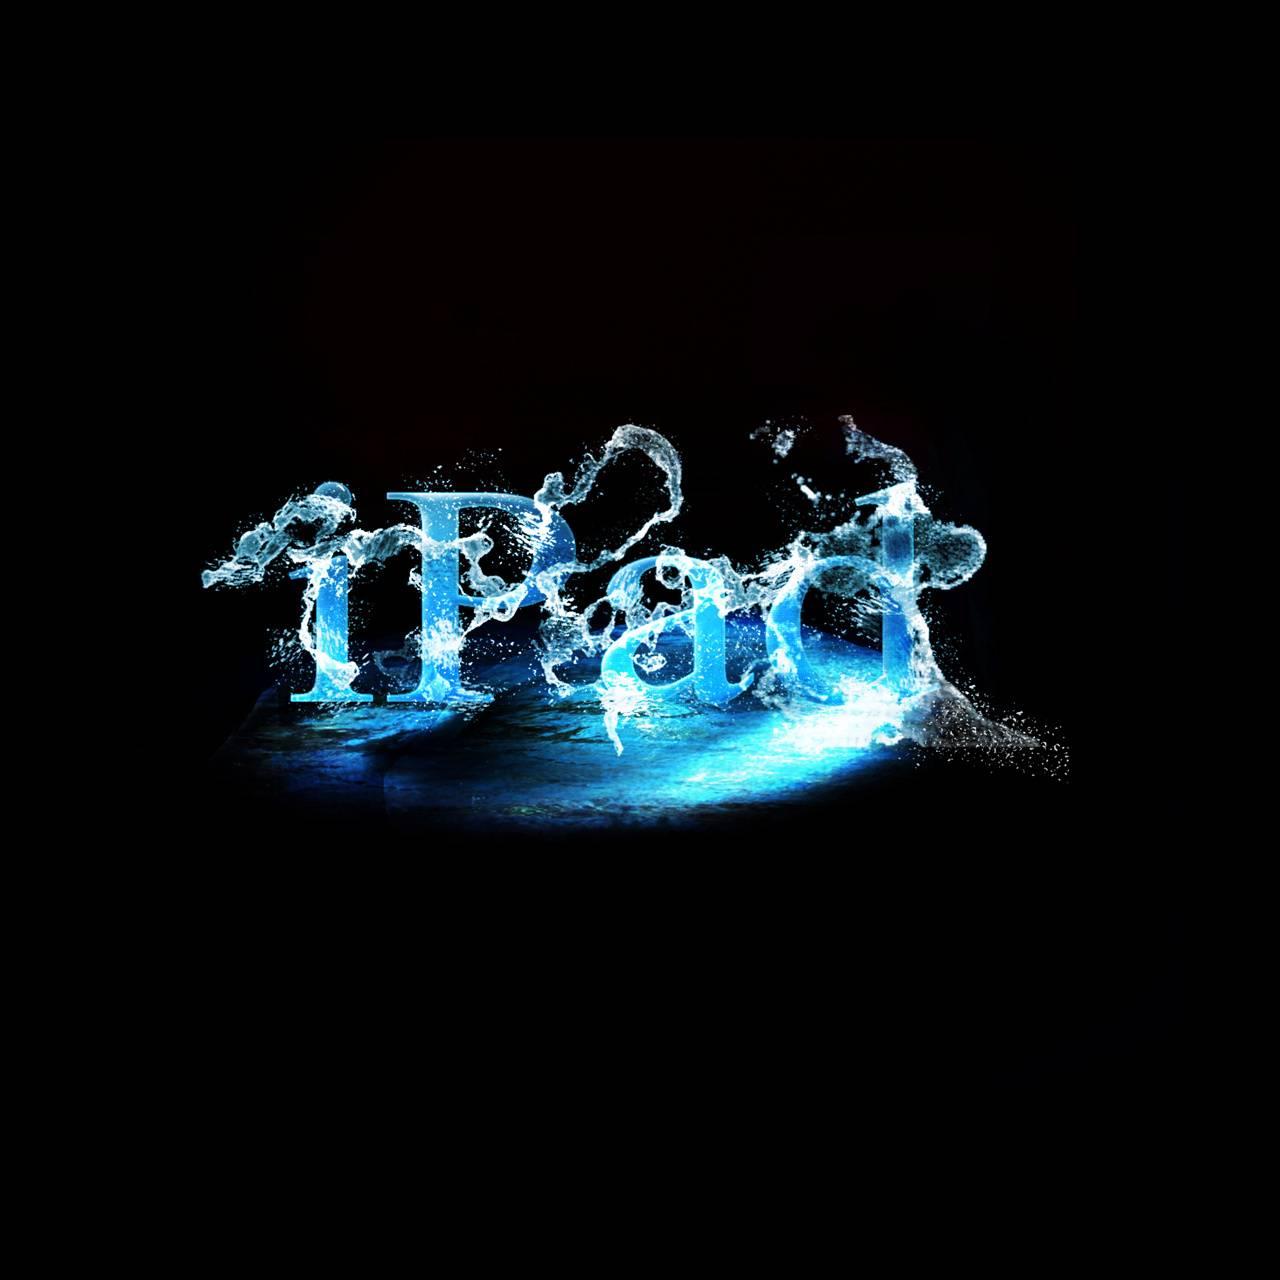 Ipad Water Splash